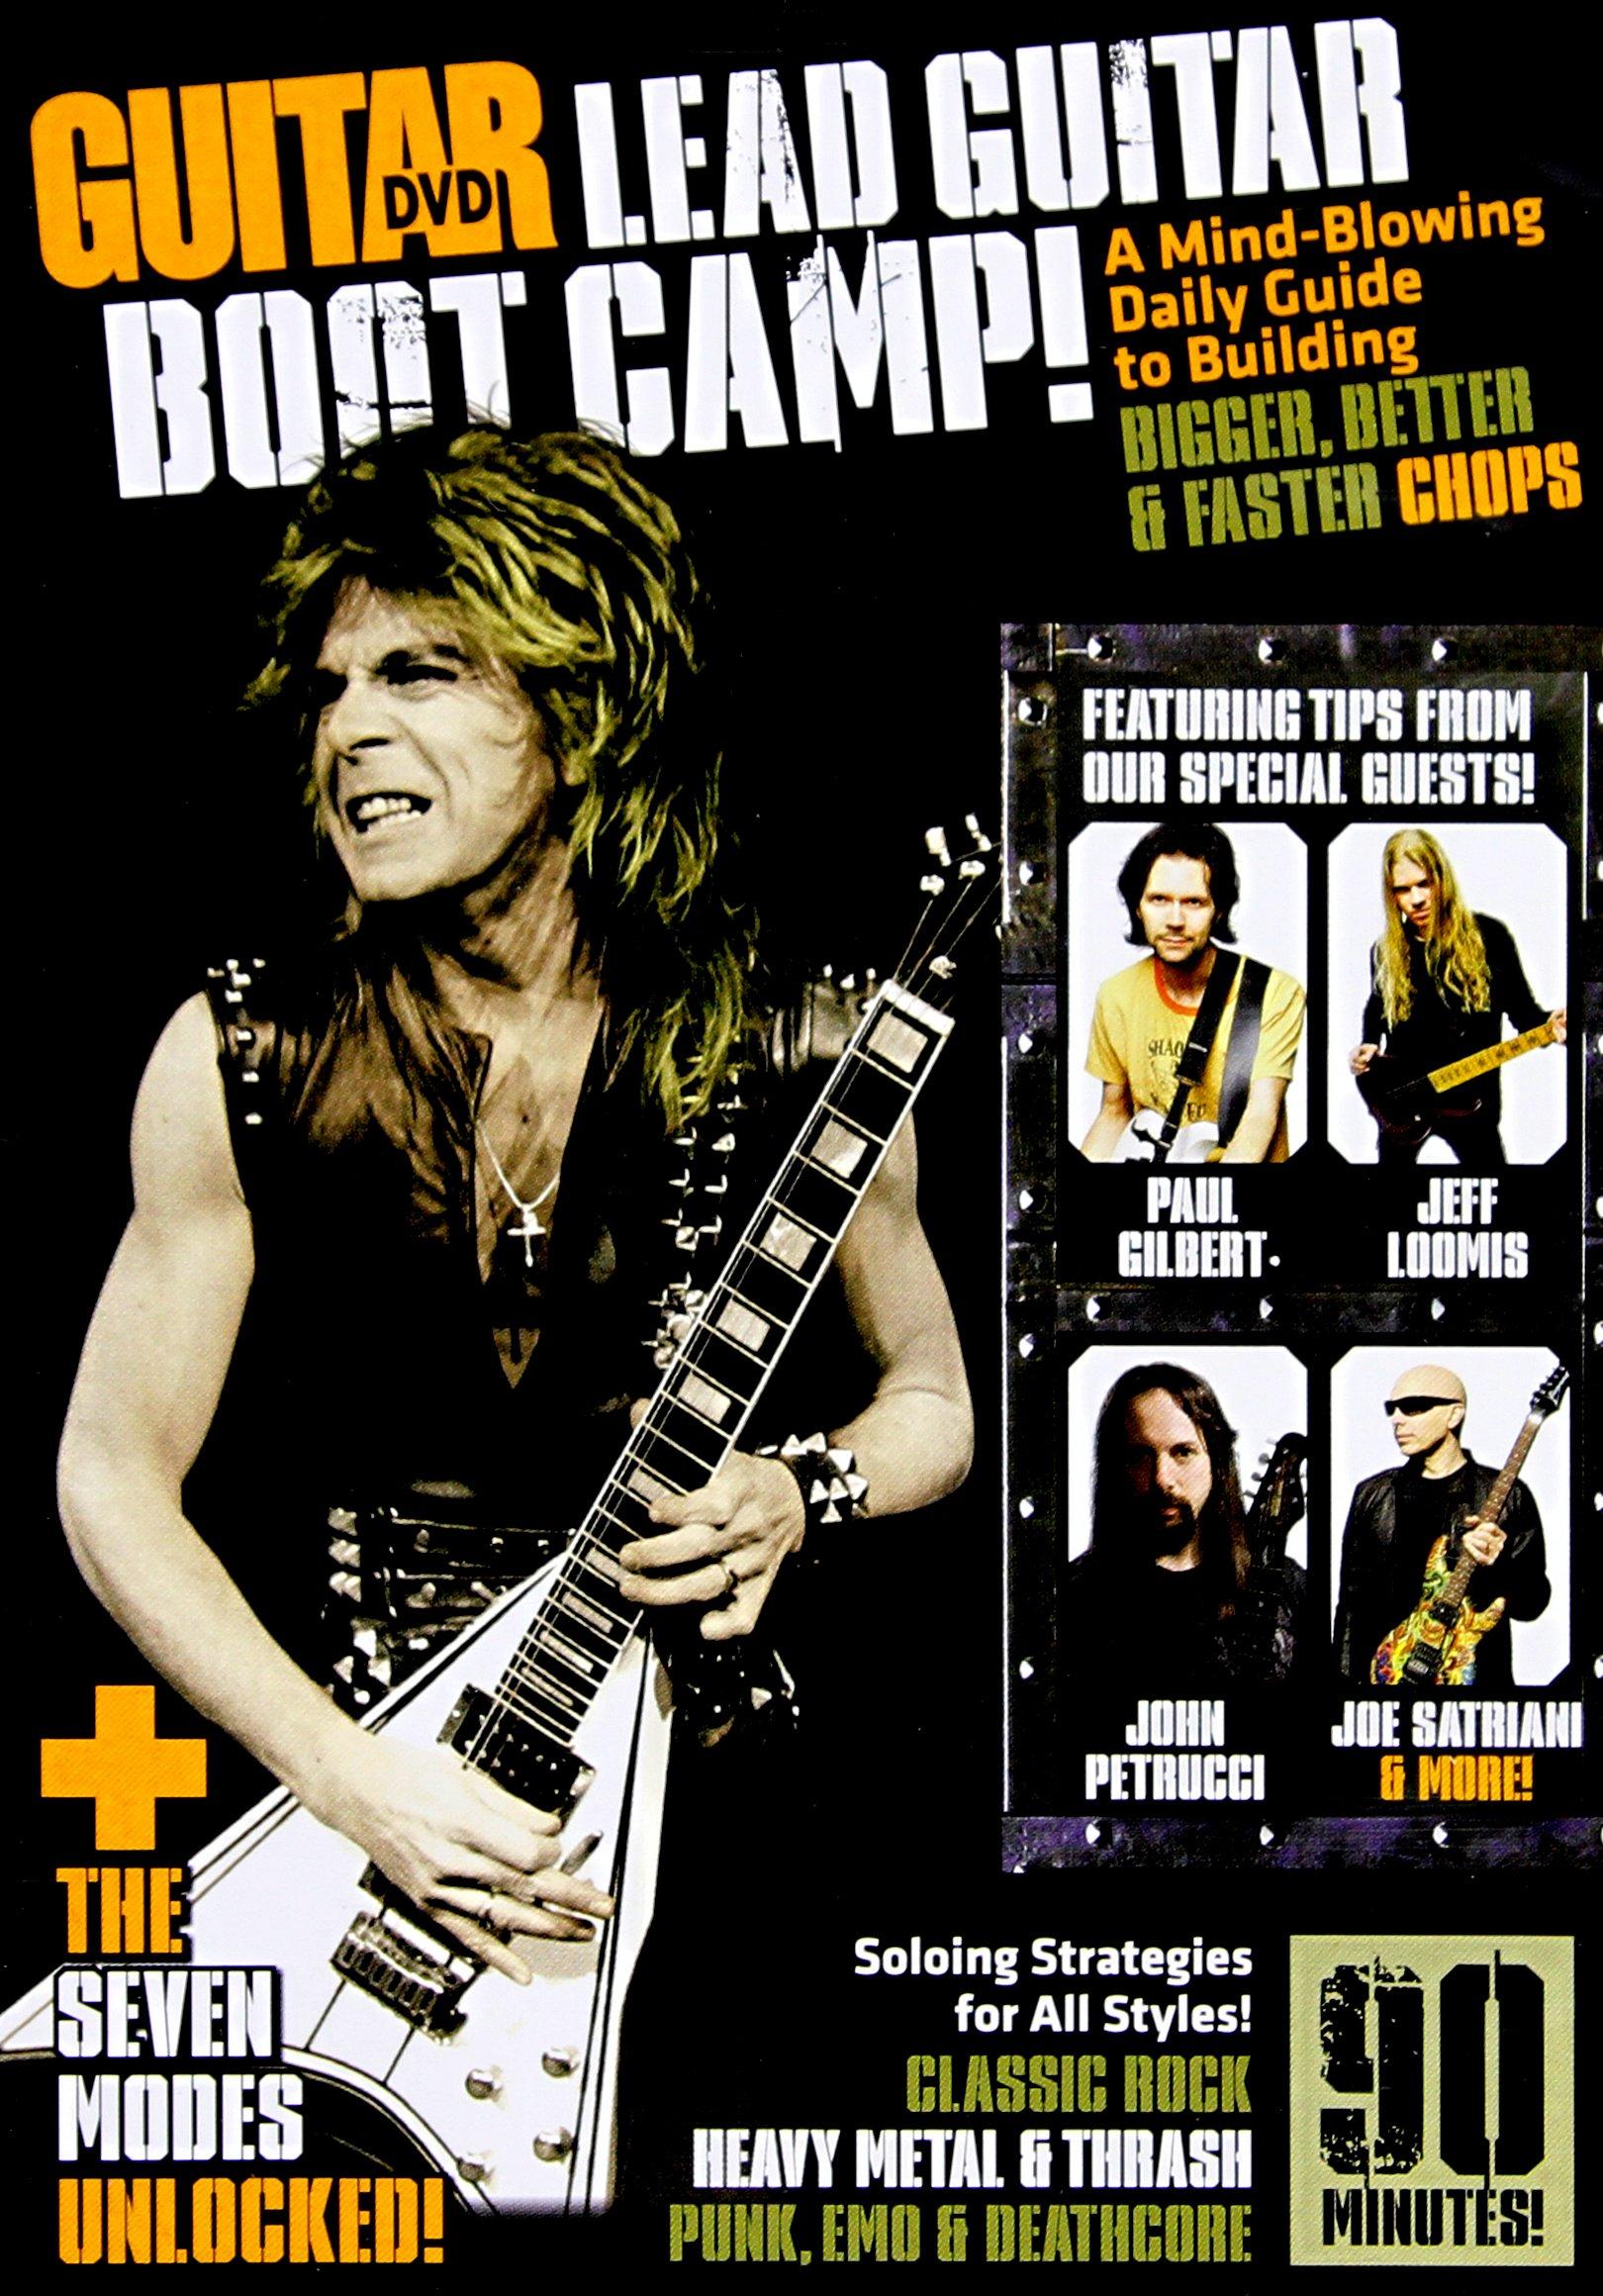 DVD : Andy Aledort - Guitar World: Lead Guitar Boot Camp (DVD)